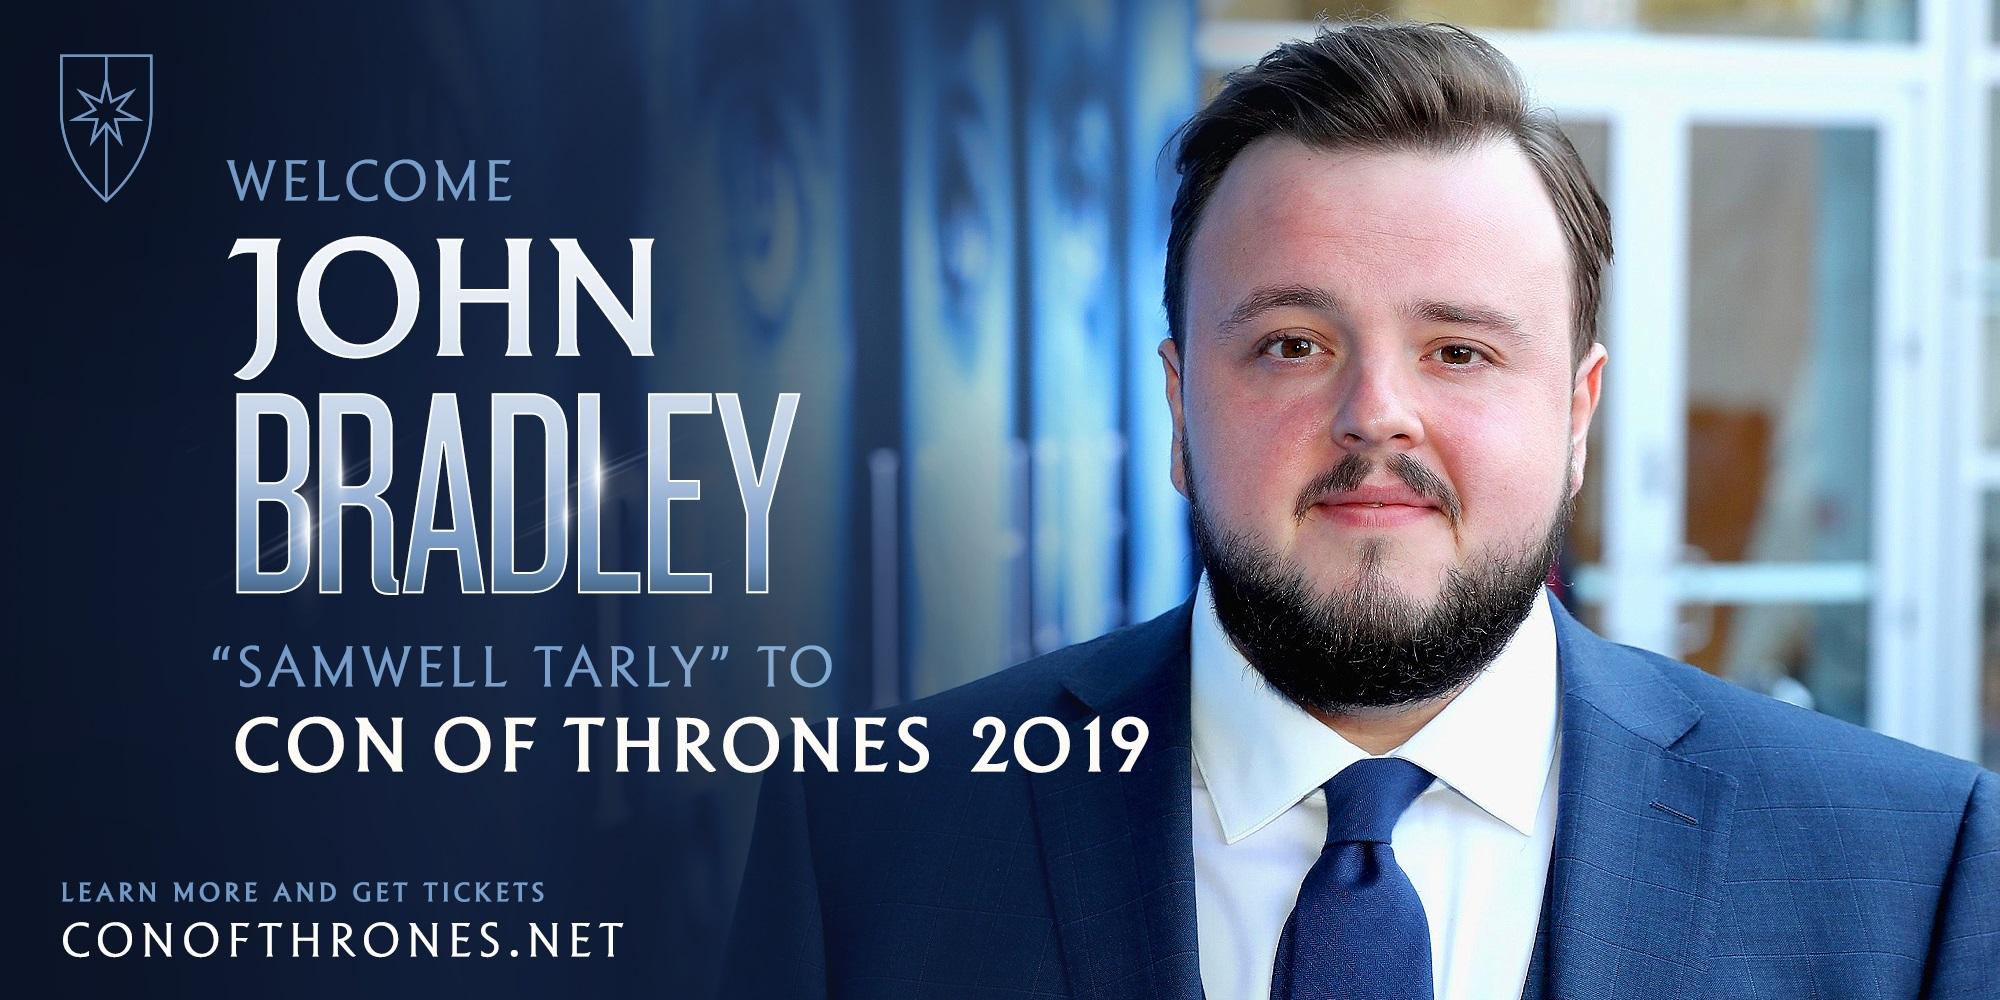 John Bradley Con of Thrones Announcement